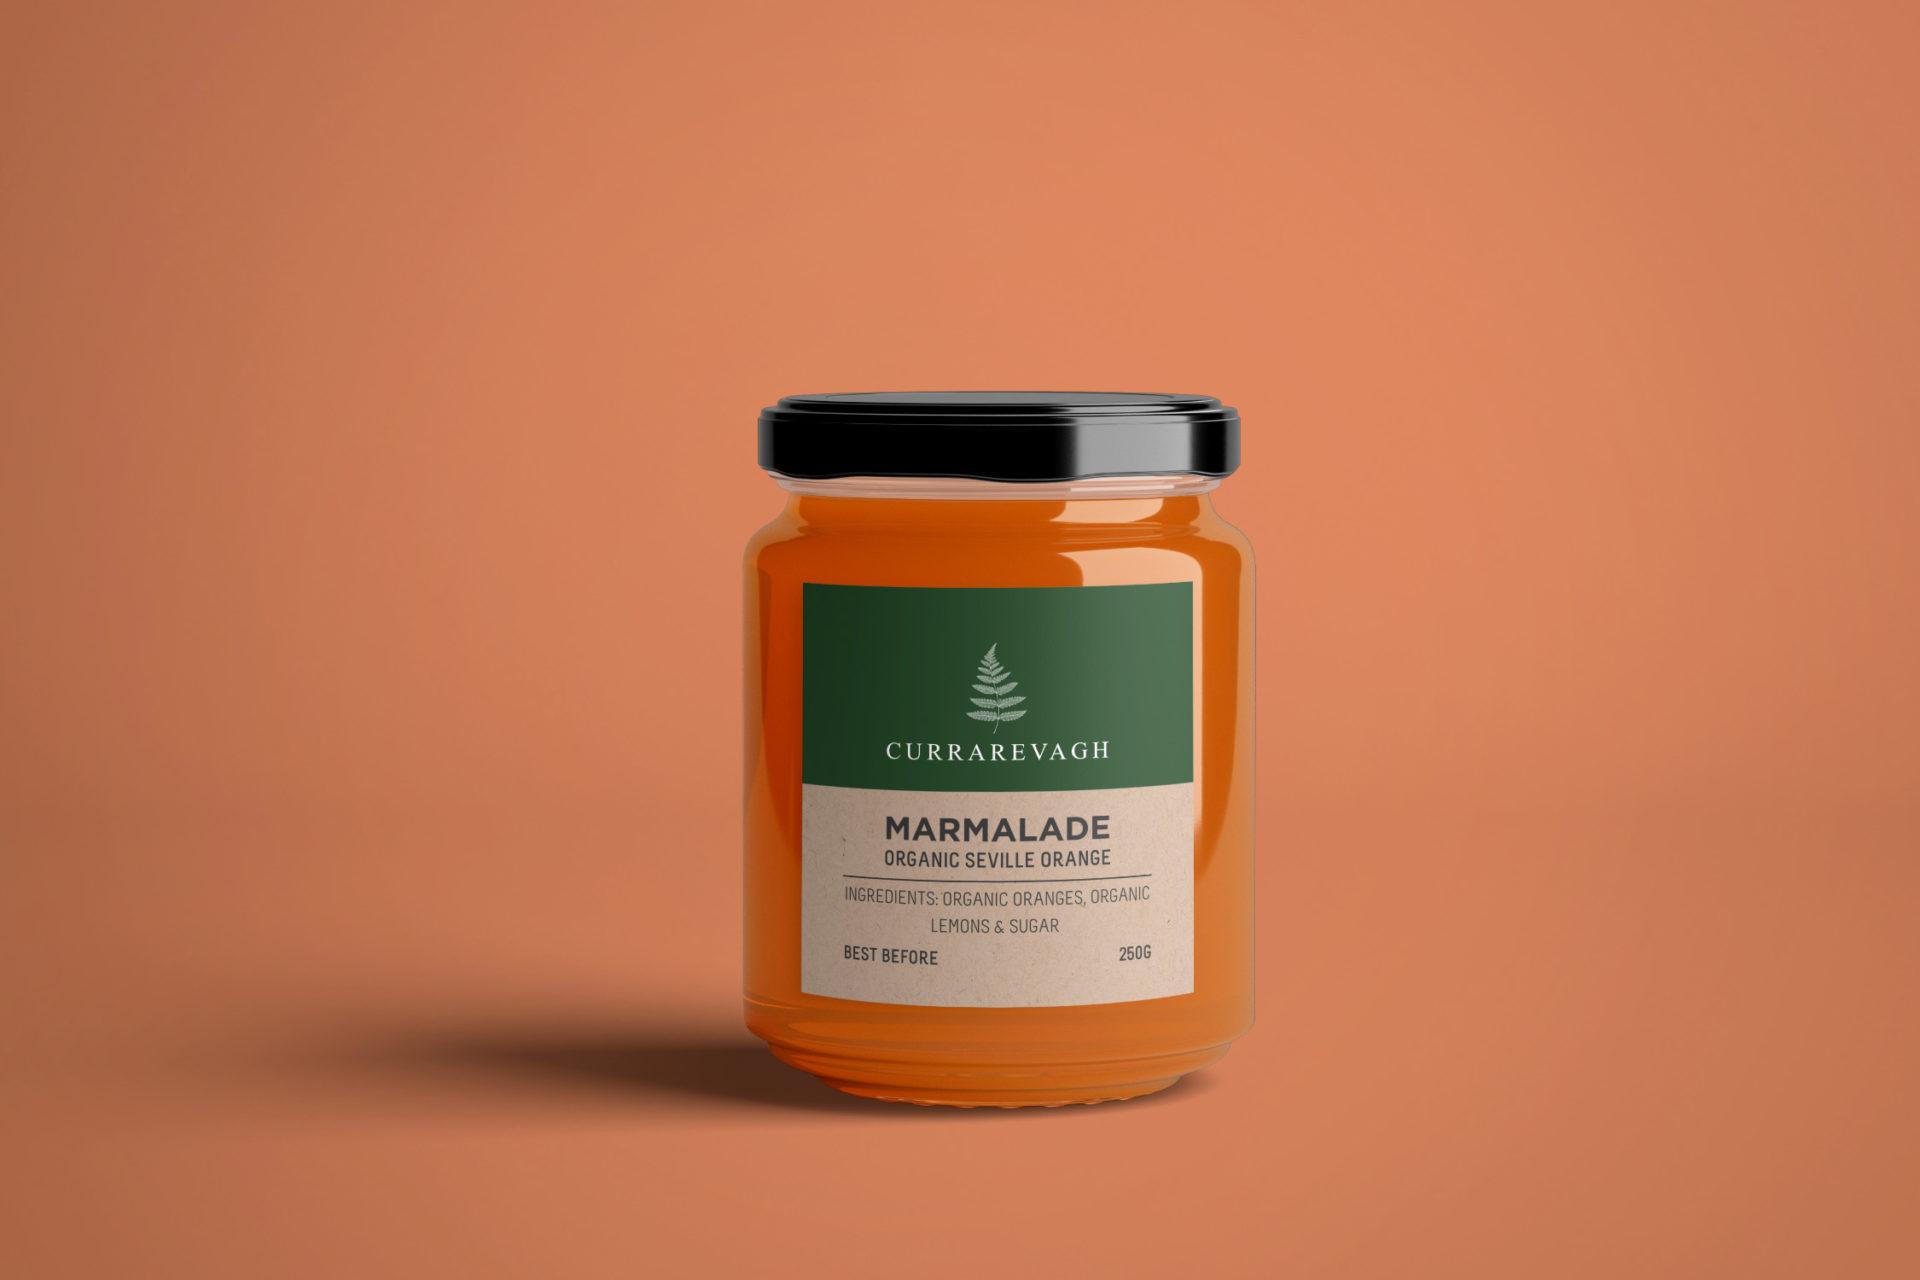 Marmalade label design for Currarevagh